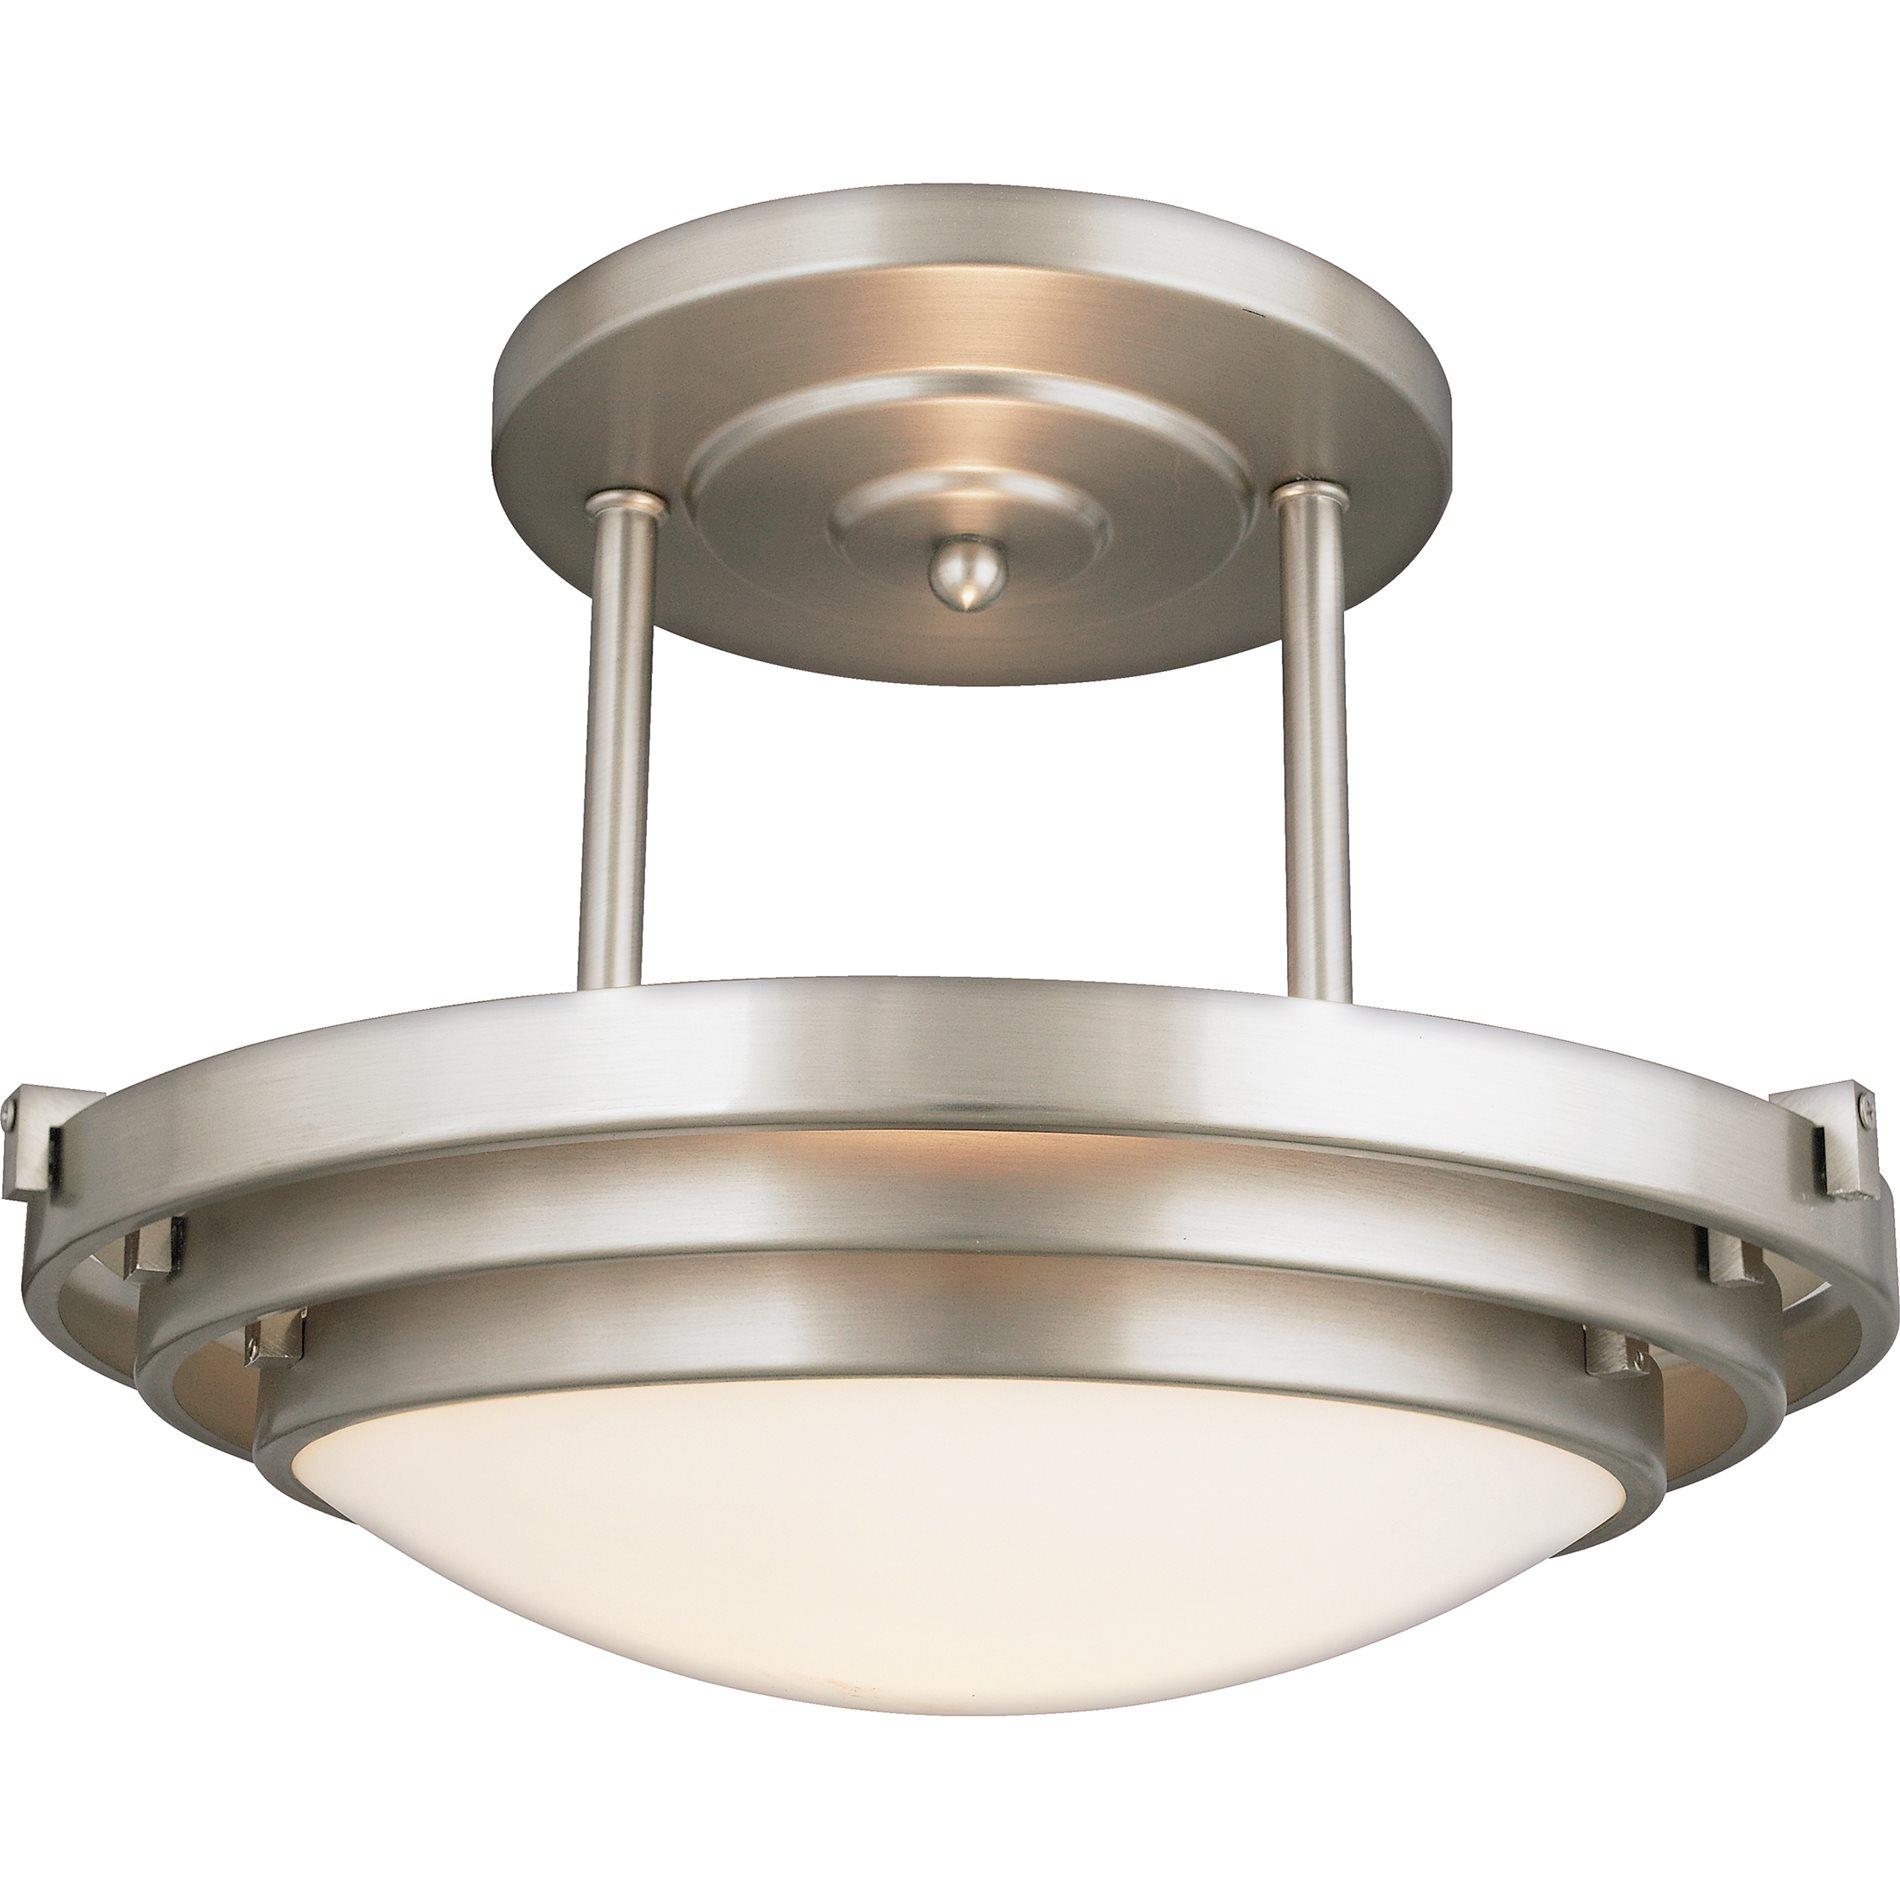 Quoizel EL1284CB Electra Modern  Contemporary Semi Flush Mount Ceiling Light QZEL1284CB